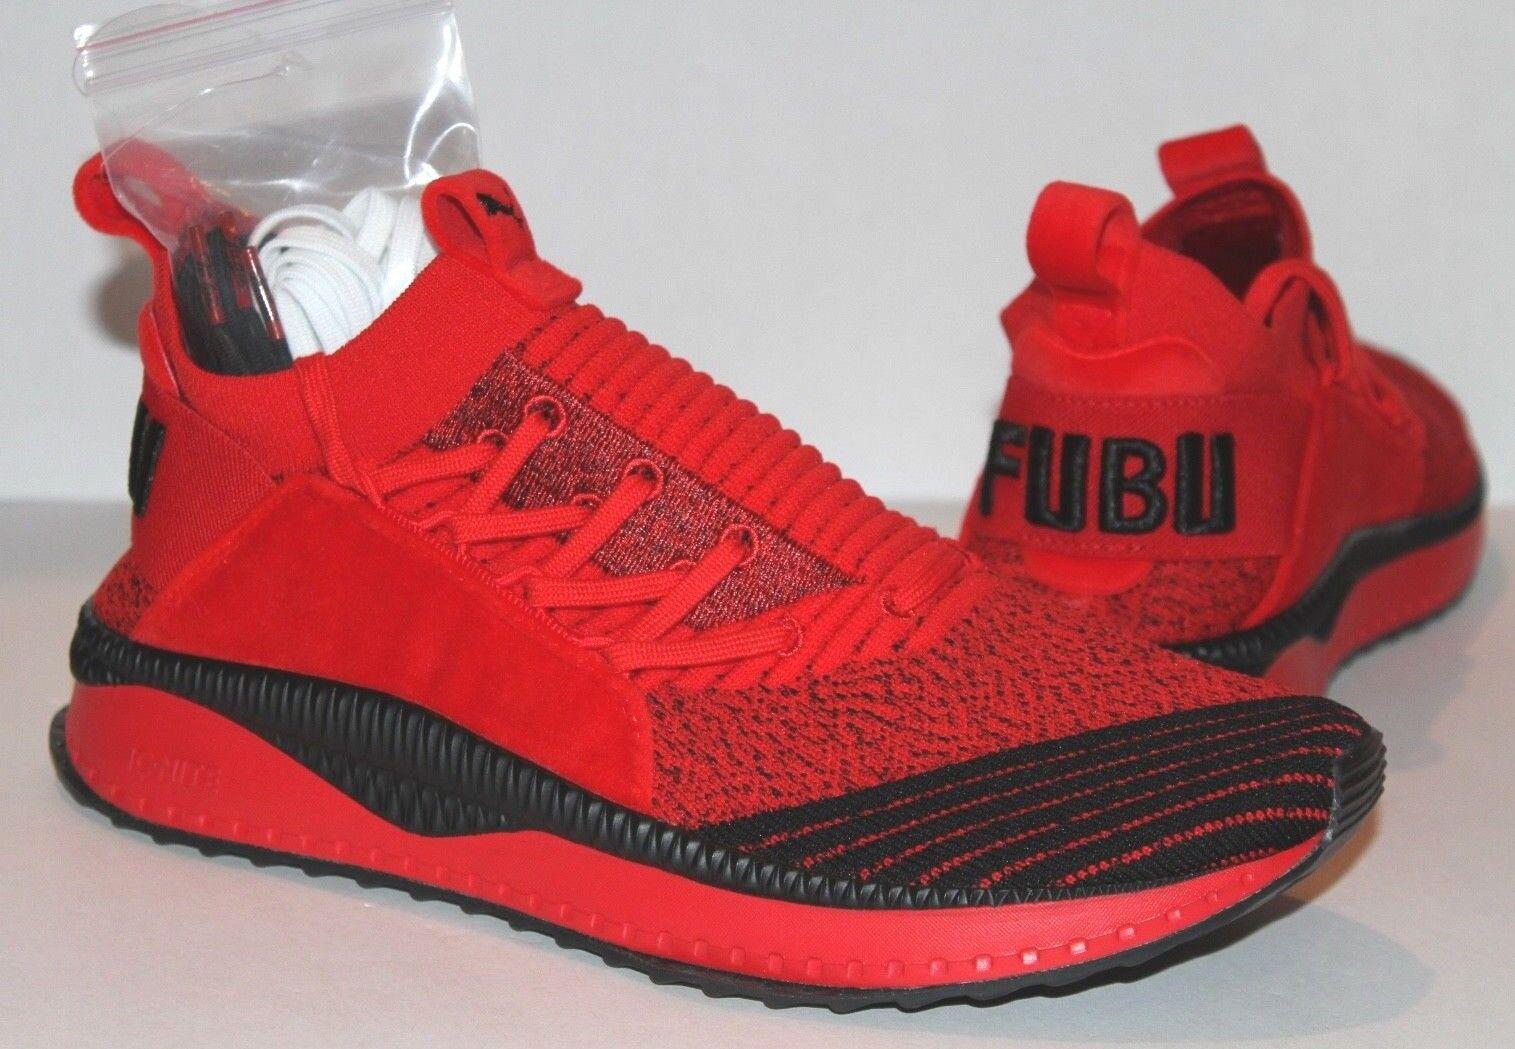 NEW PUMA X X X TSUGI JUN FUBU Men shoes 9.5 10 10.5 11 Red Black High Risk 367440-01 5ed3bb